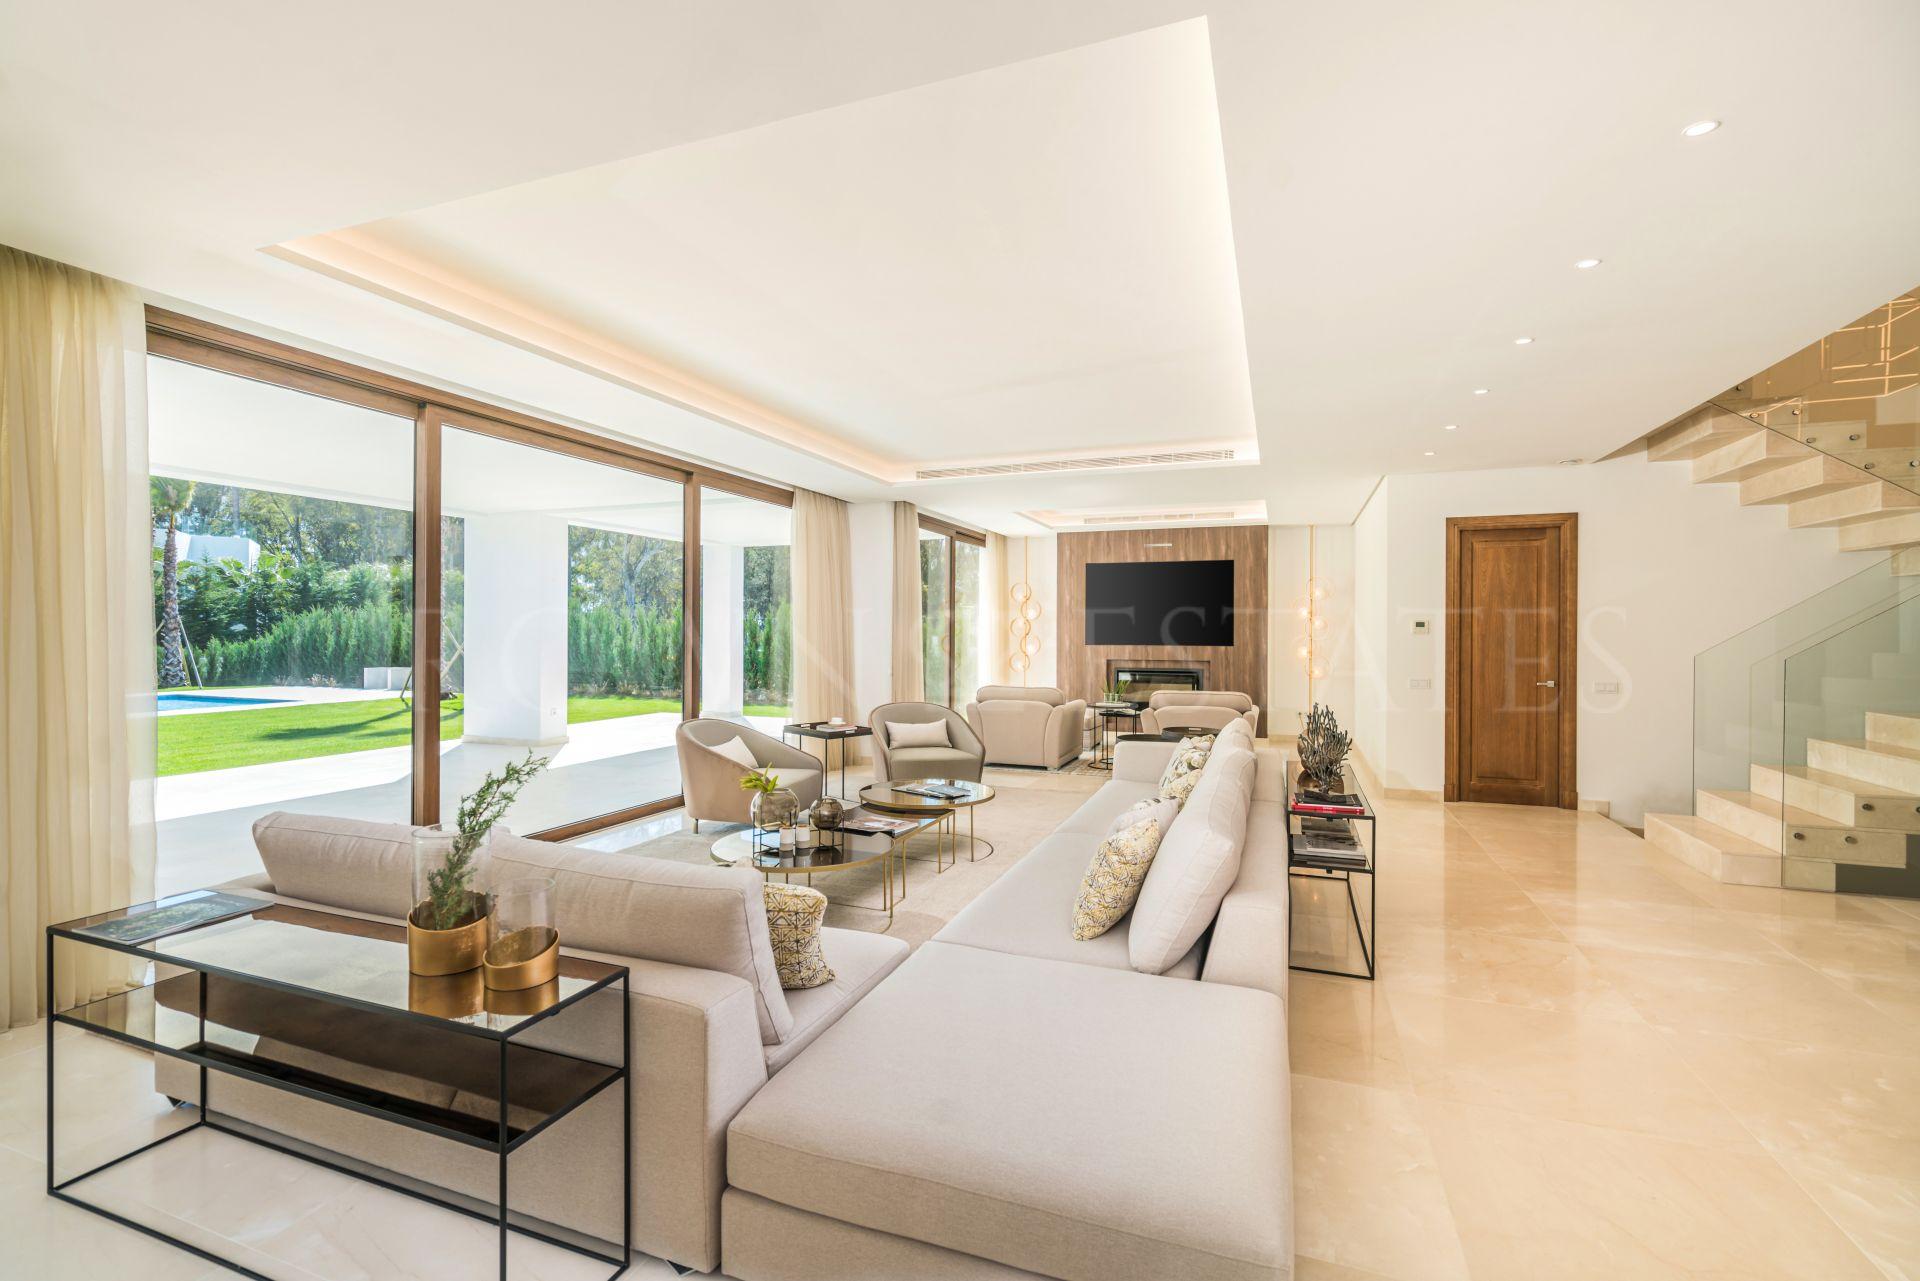 Stunning Contemporary Villa in Guadalmina Baja, San Pedro de Alcantara